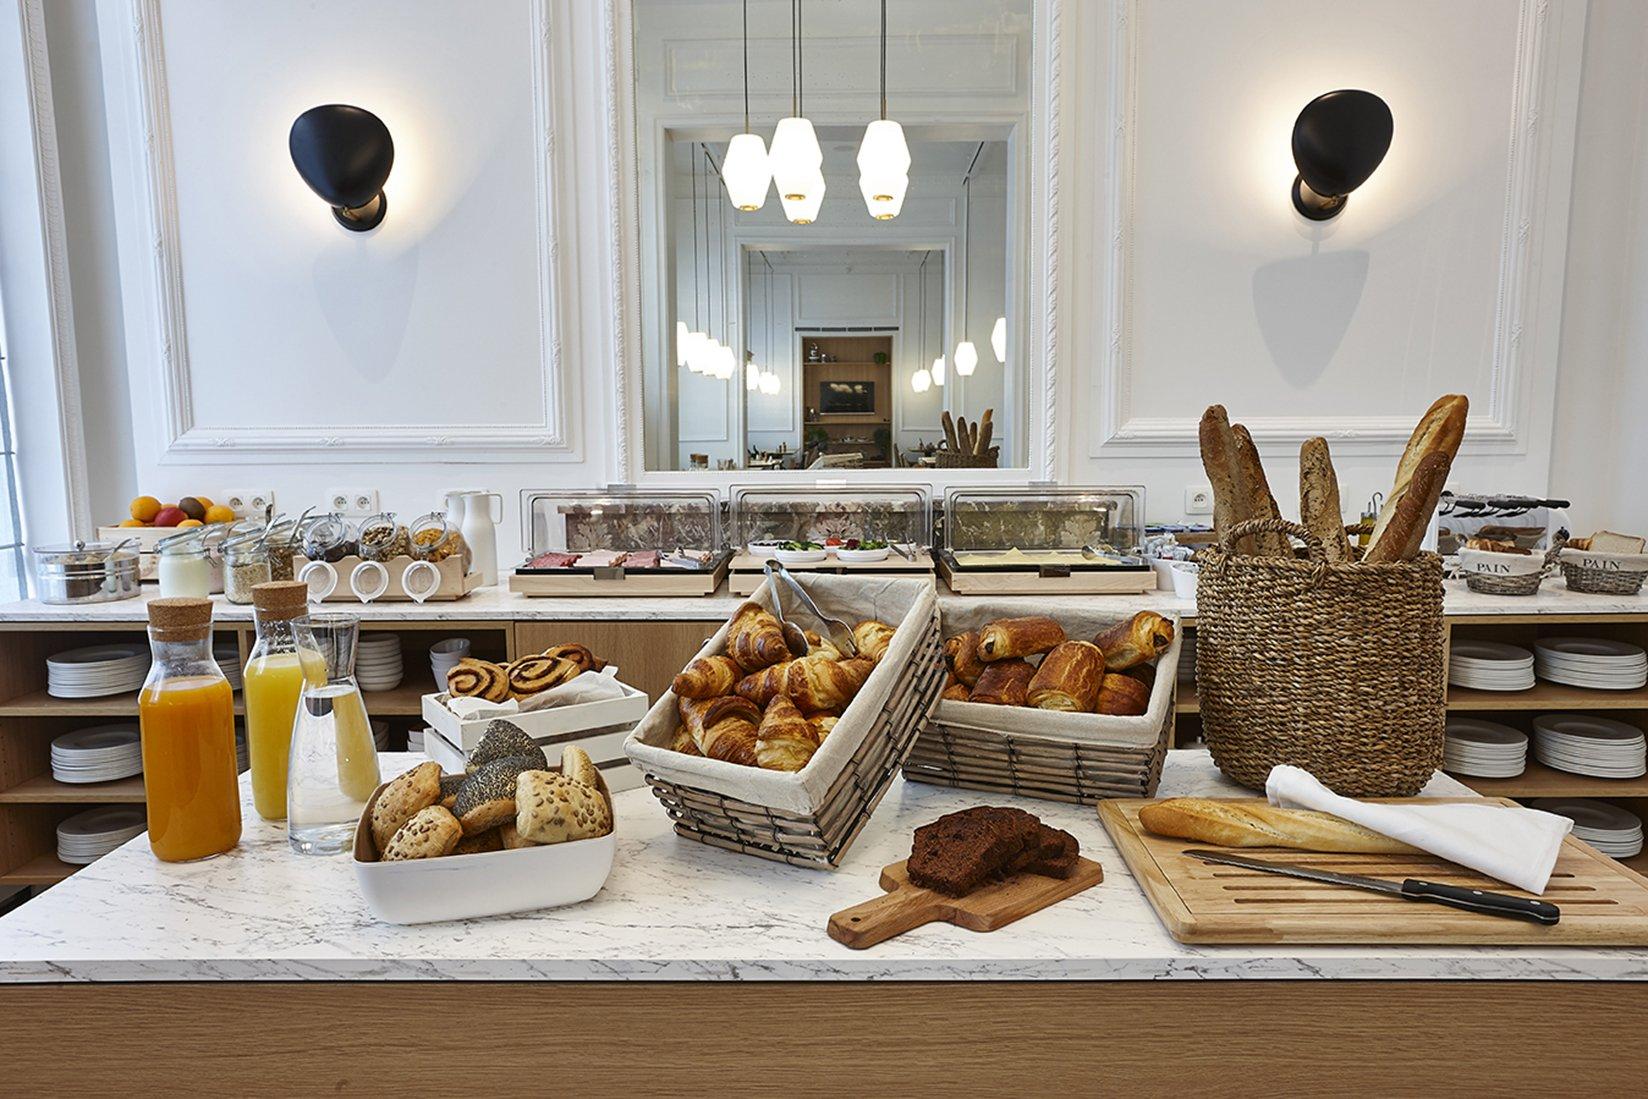 hygge hotel brussels belgium breakfast